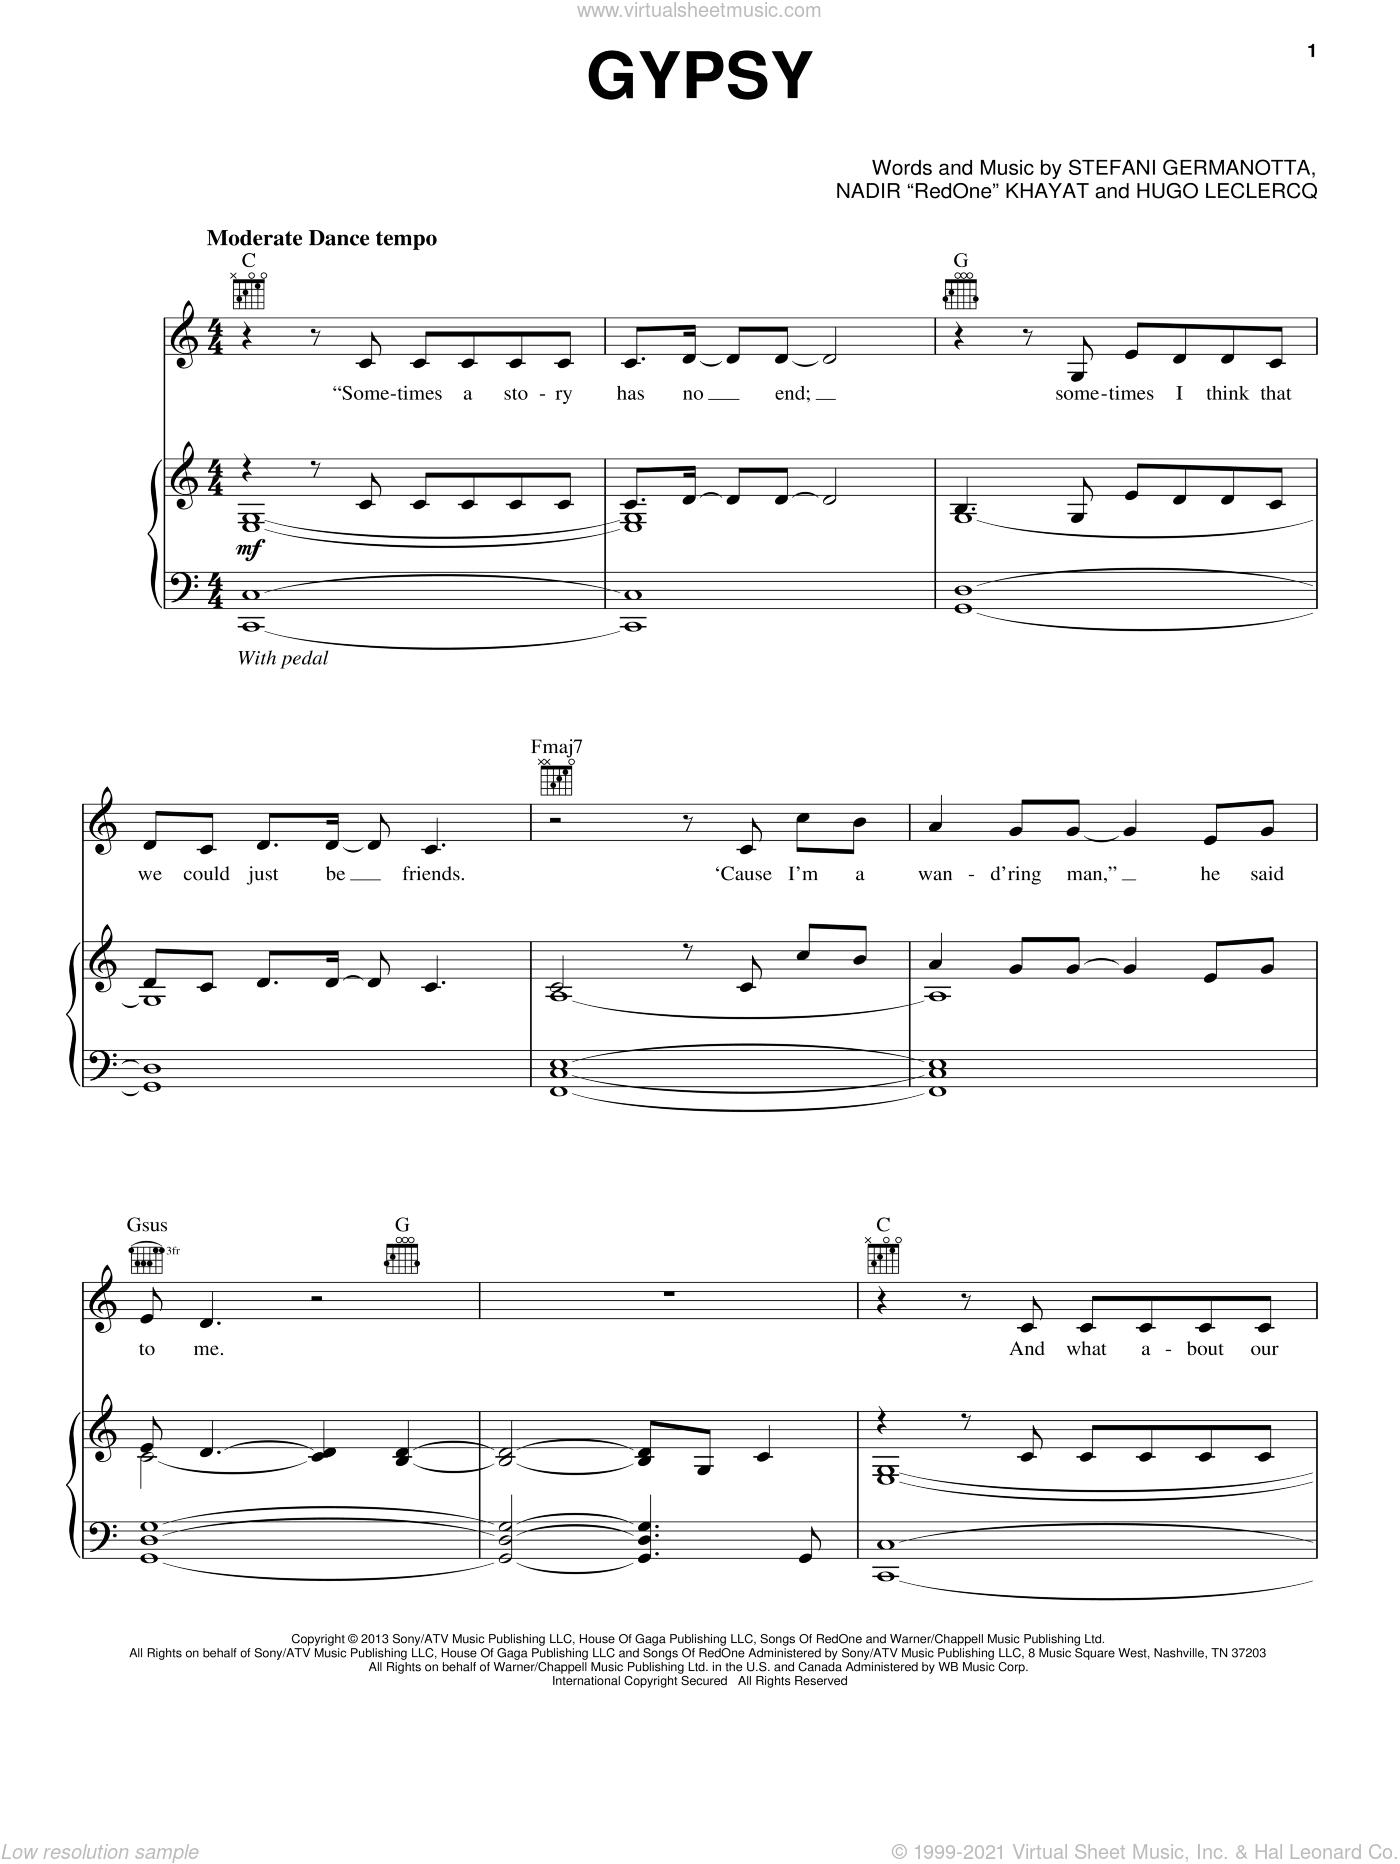 Gypsy sheet music for voice, piano or guitar by Lady Gaga, Hugo Leclercq and Nadir 'RedOne' Khayat, intermediate skill level